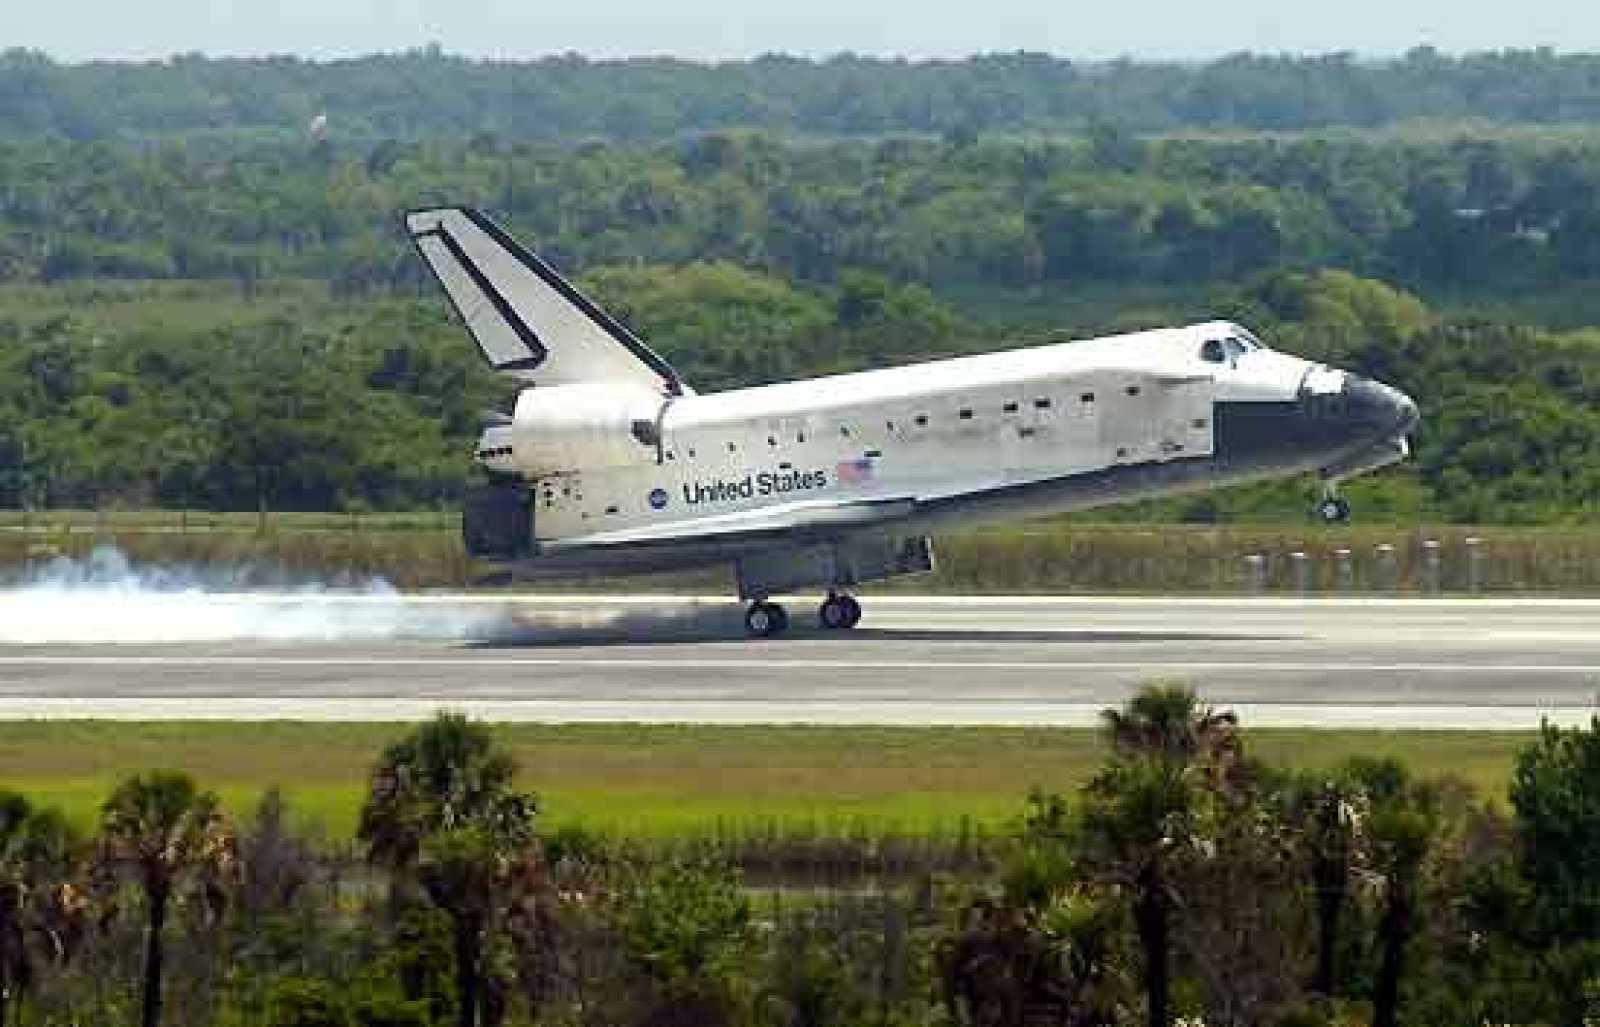 El Discovery aterriza con éxito